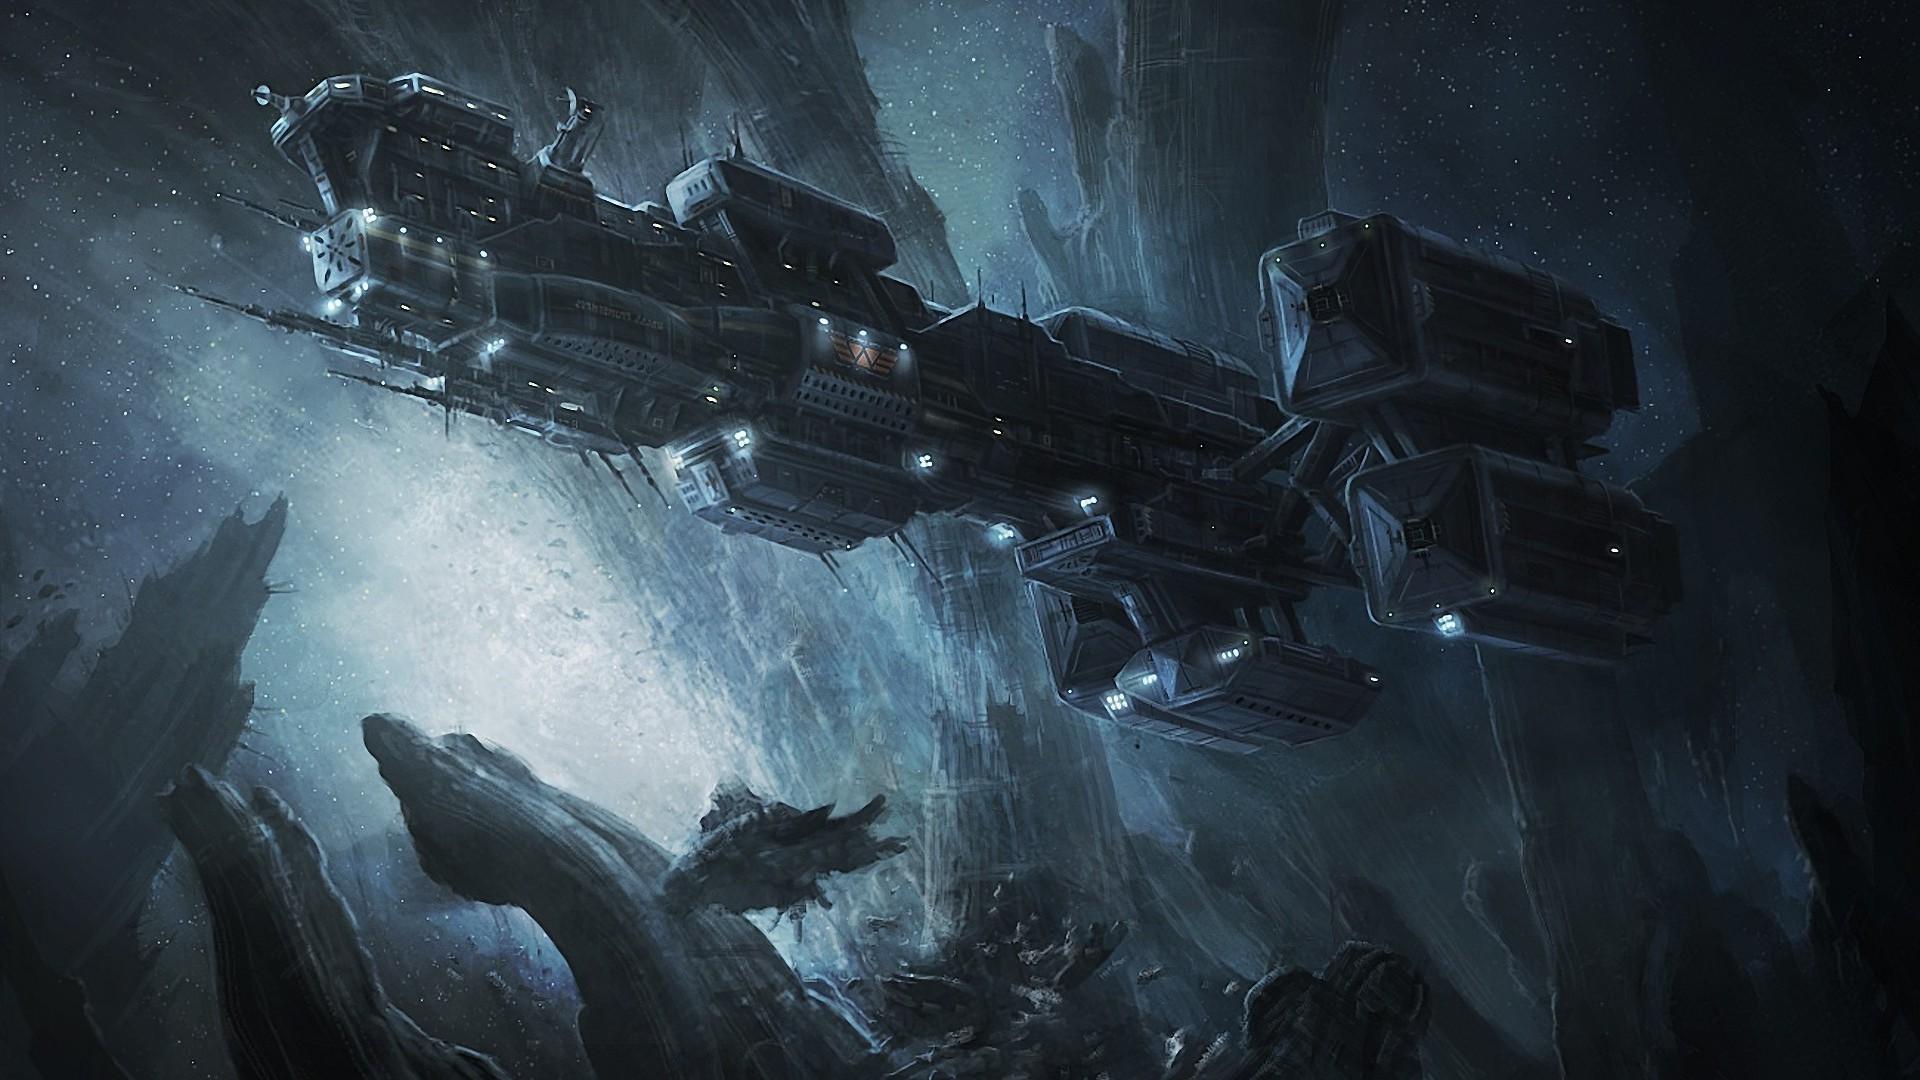 artwork, Digital Art, Spaceship, Alien (movie), Weyland Corporation, Space  Wallpapers HD / Desktop and Mobile Backgrounds